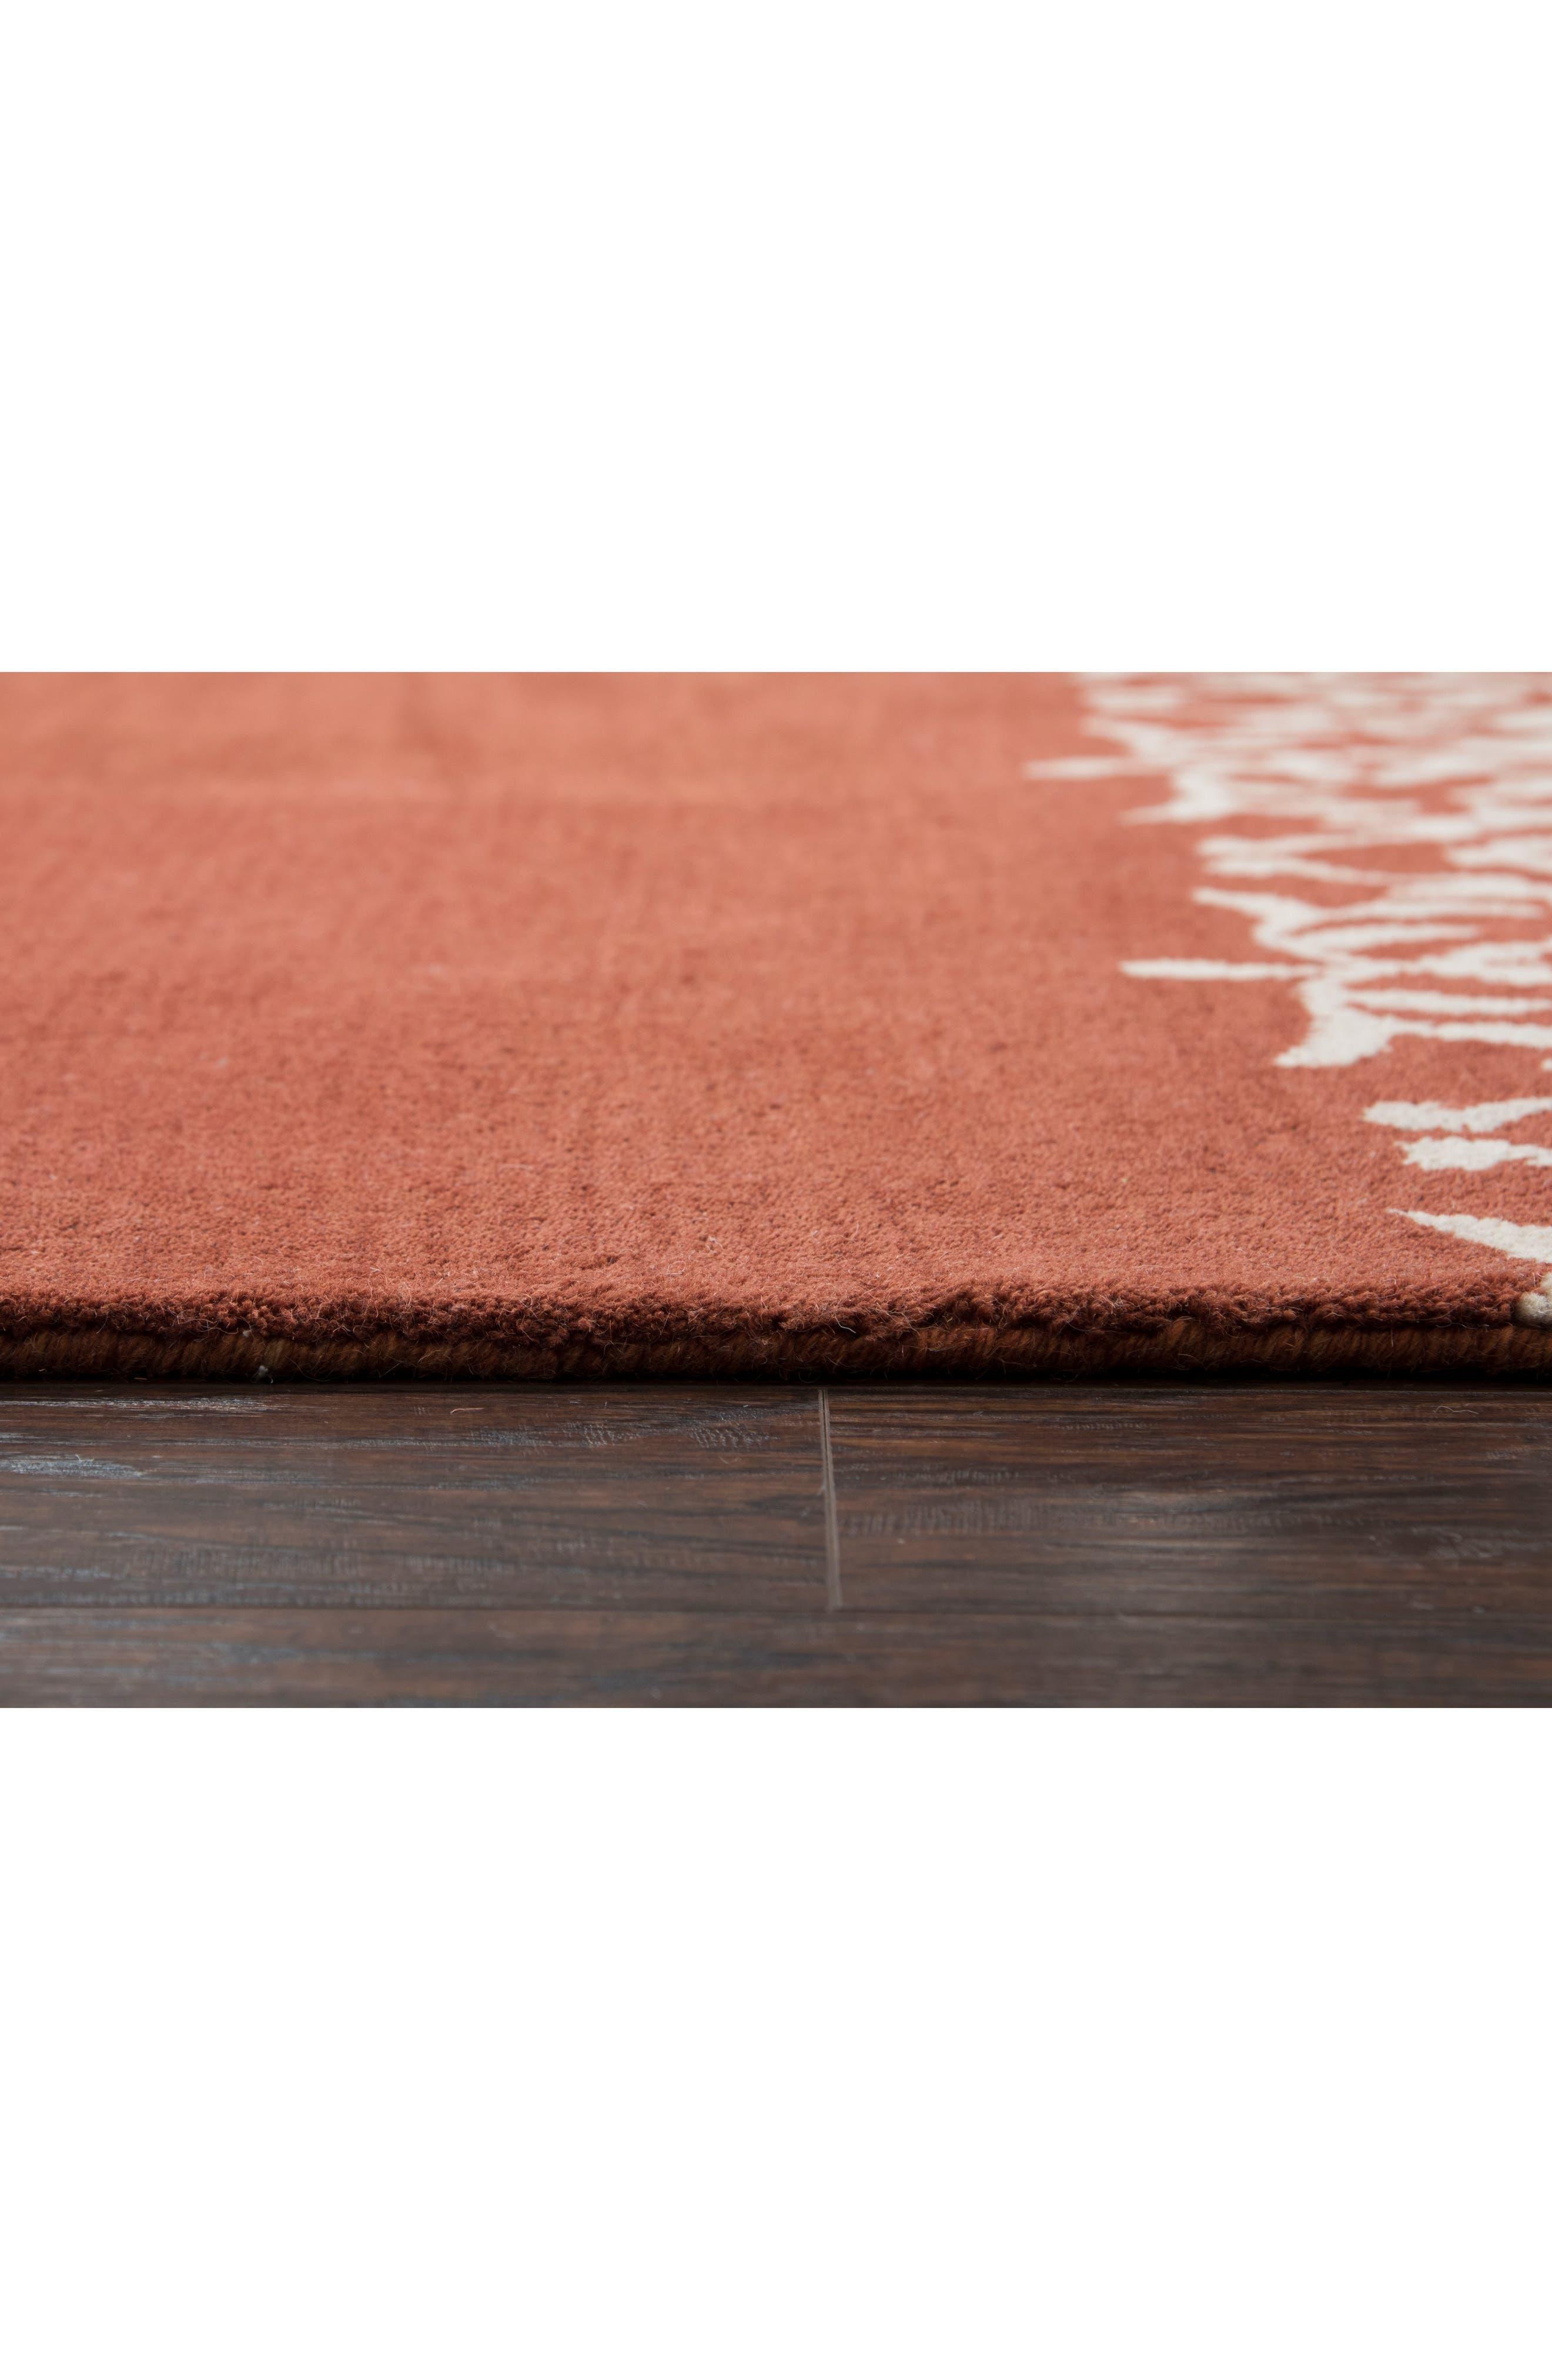 Framed Medallion Hand Tufted Wool Area Rug,                             Alternate thumbnail 15, color,